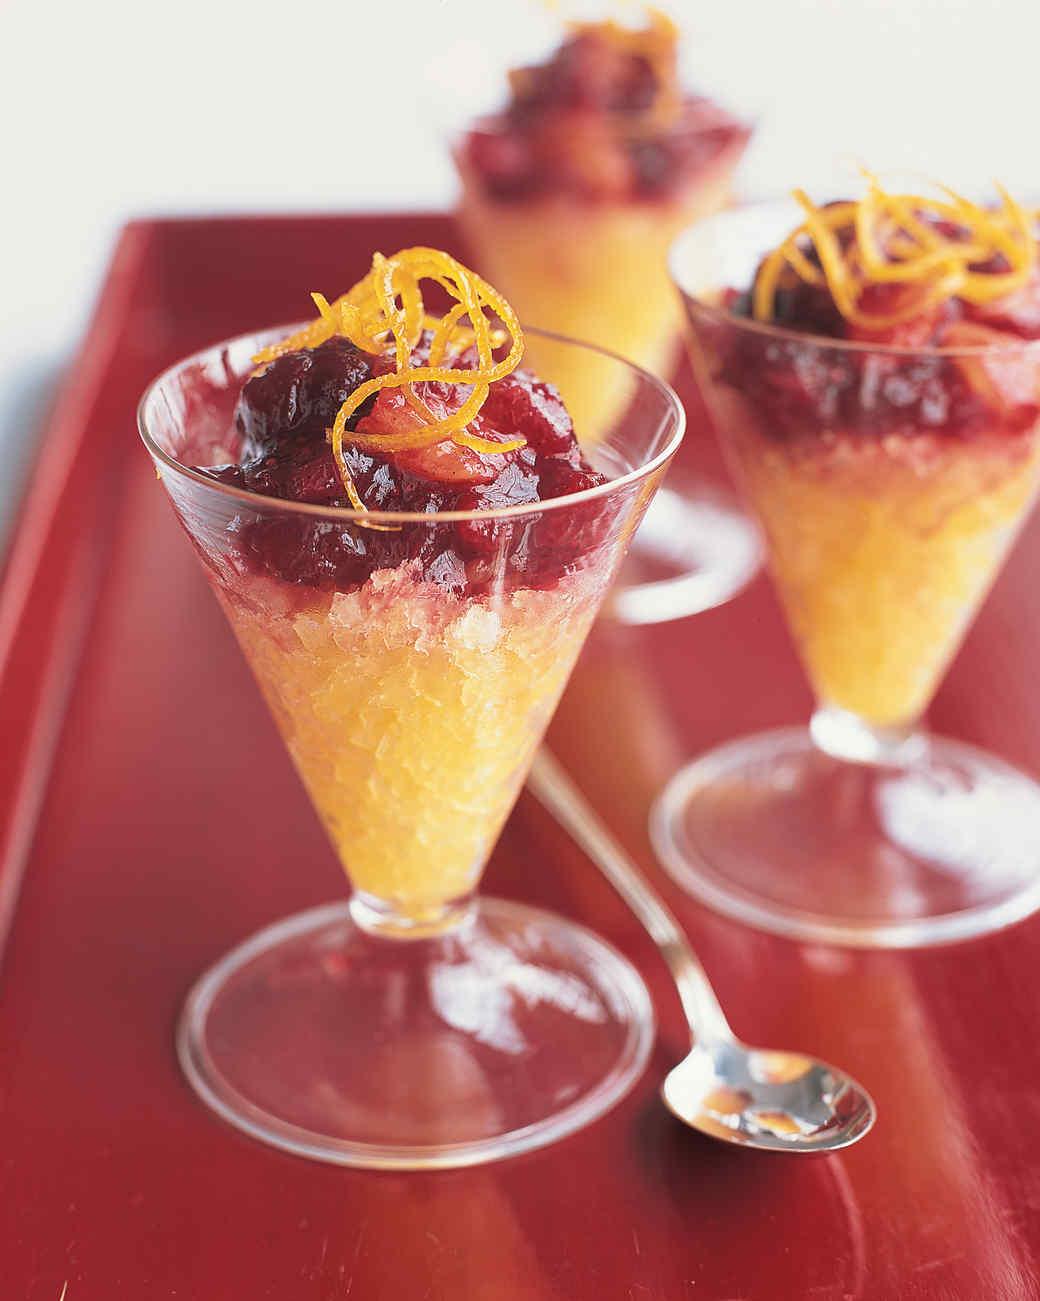 Cranberry-Vanilla Compote with Orange Ice